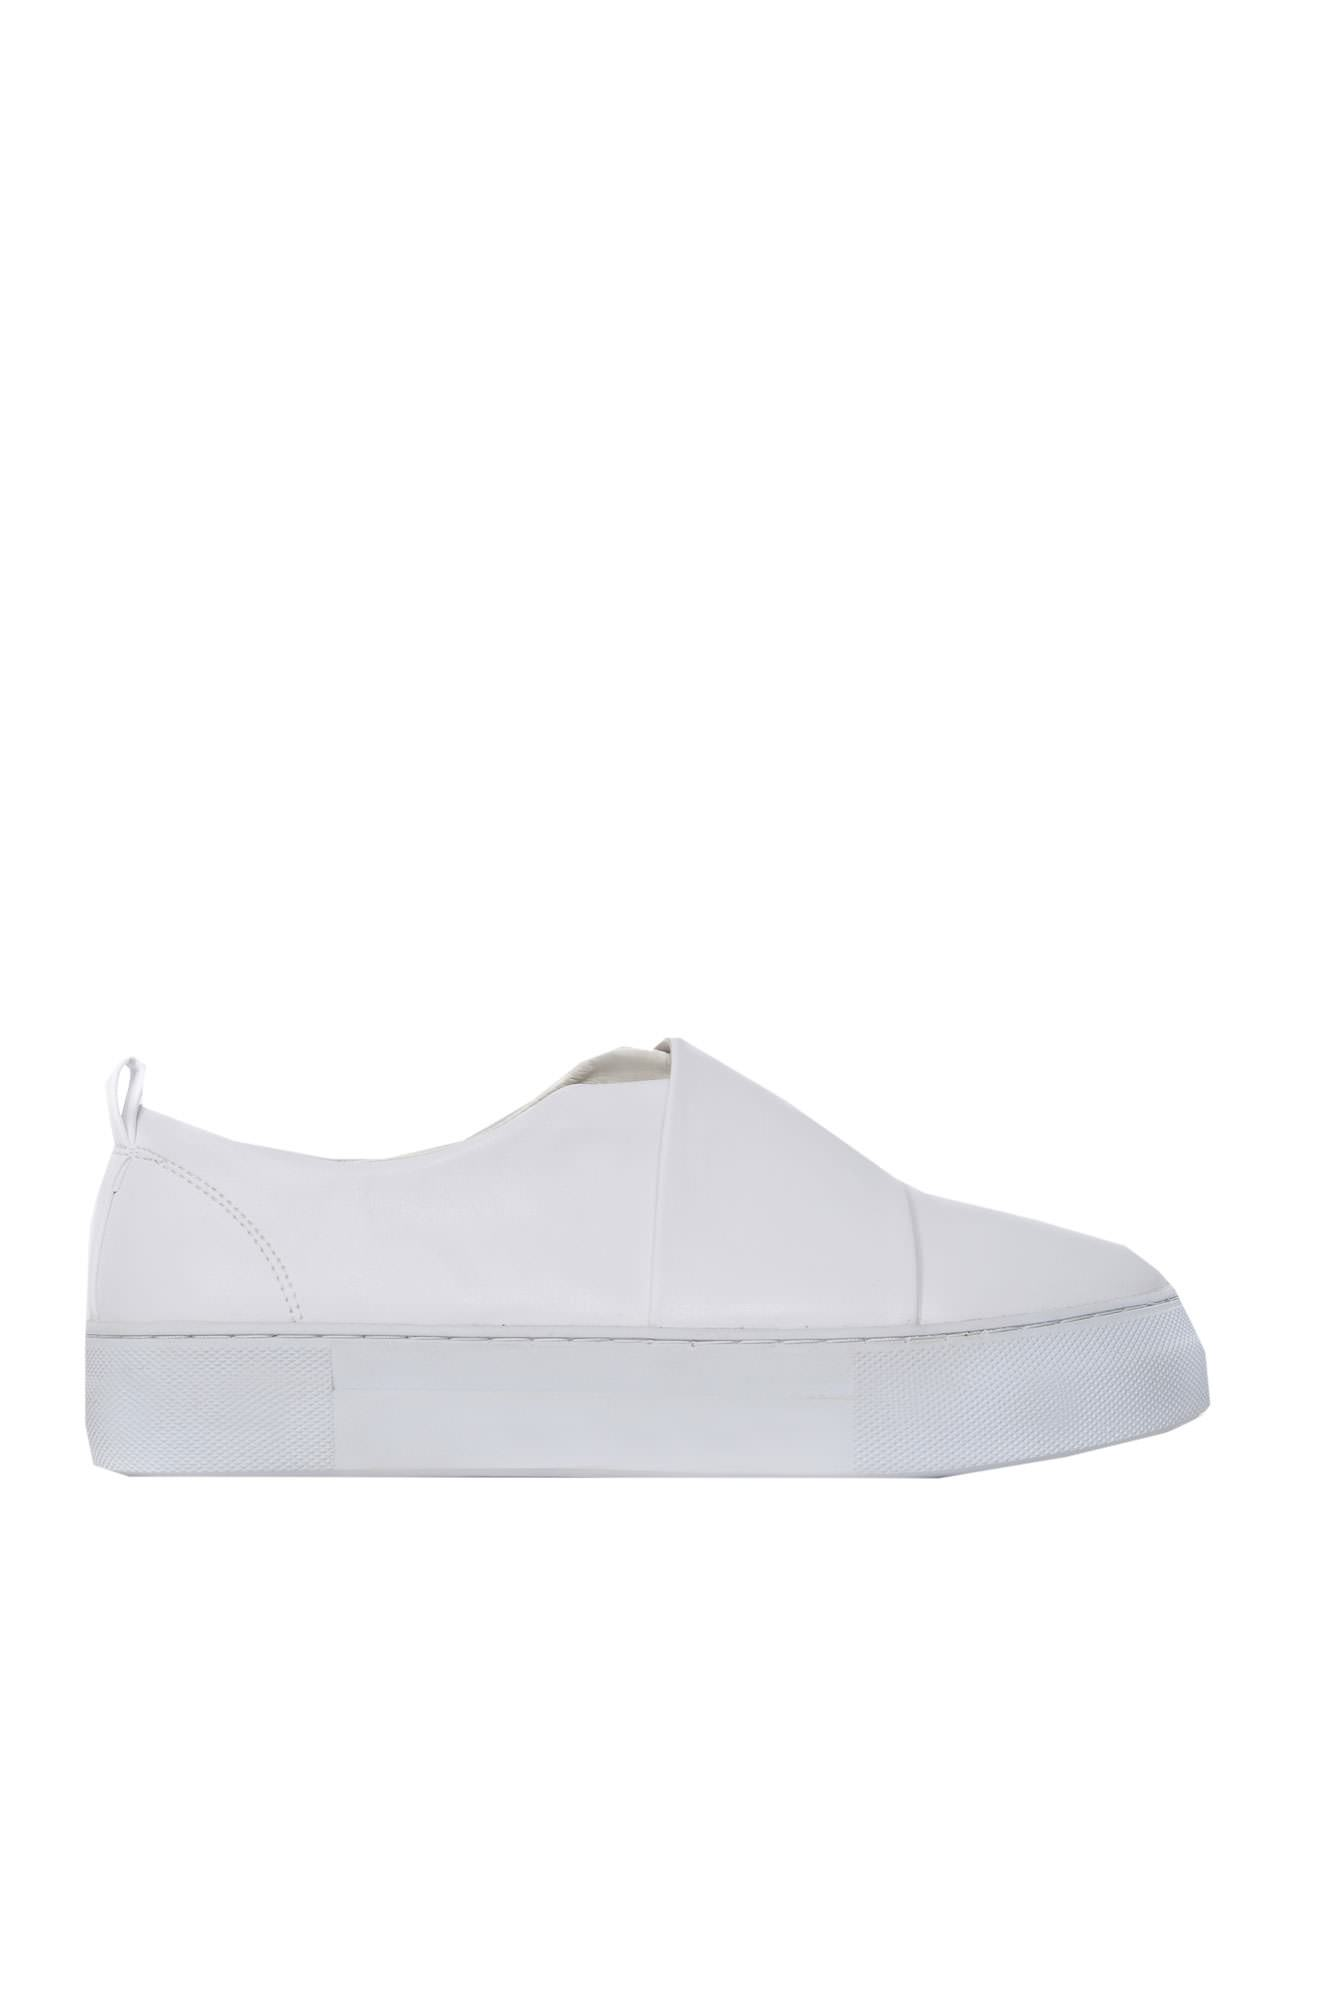 0 - Sneakers PO12091606-ALB